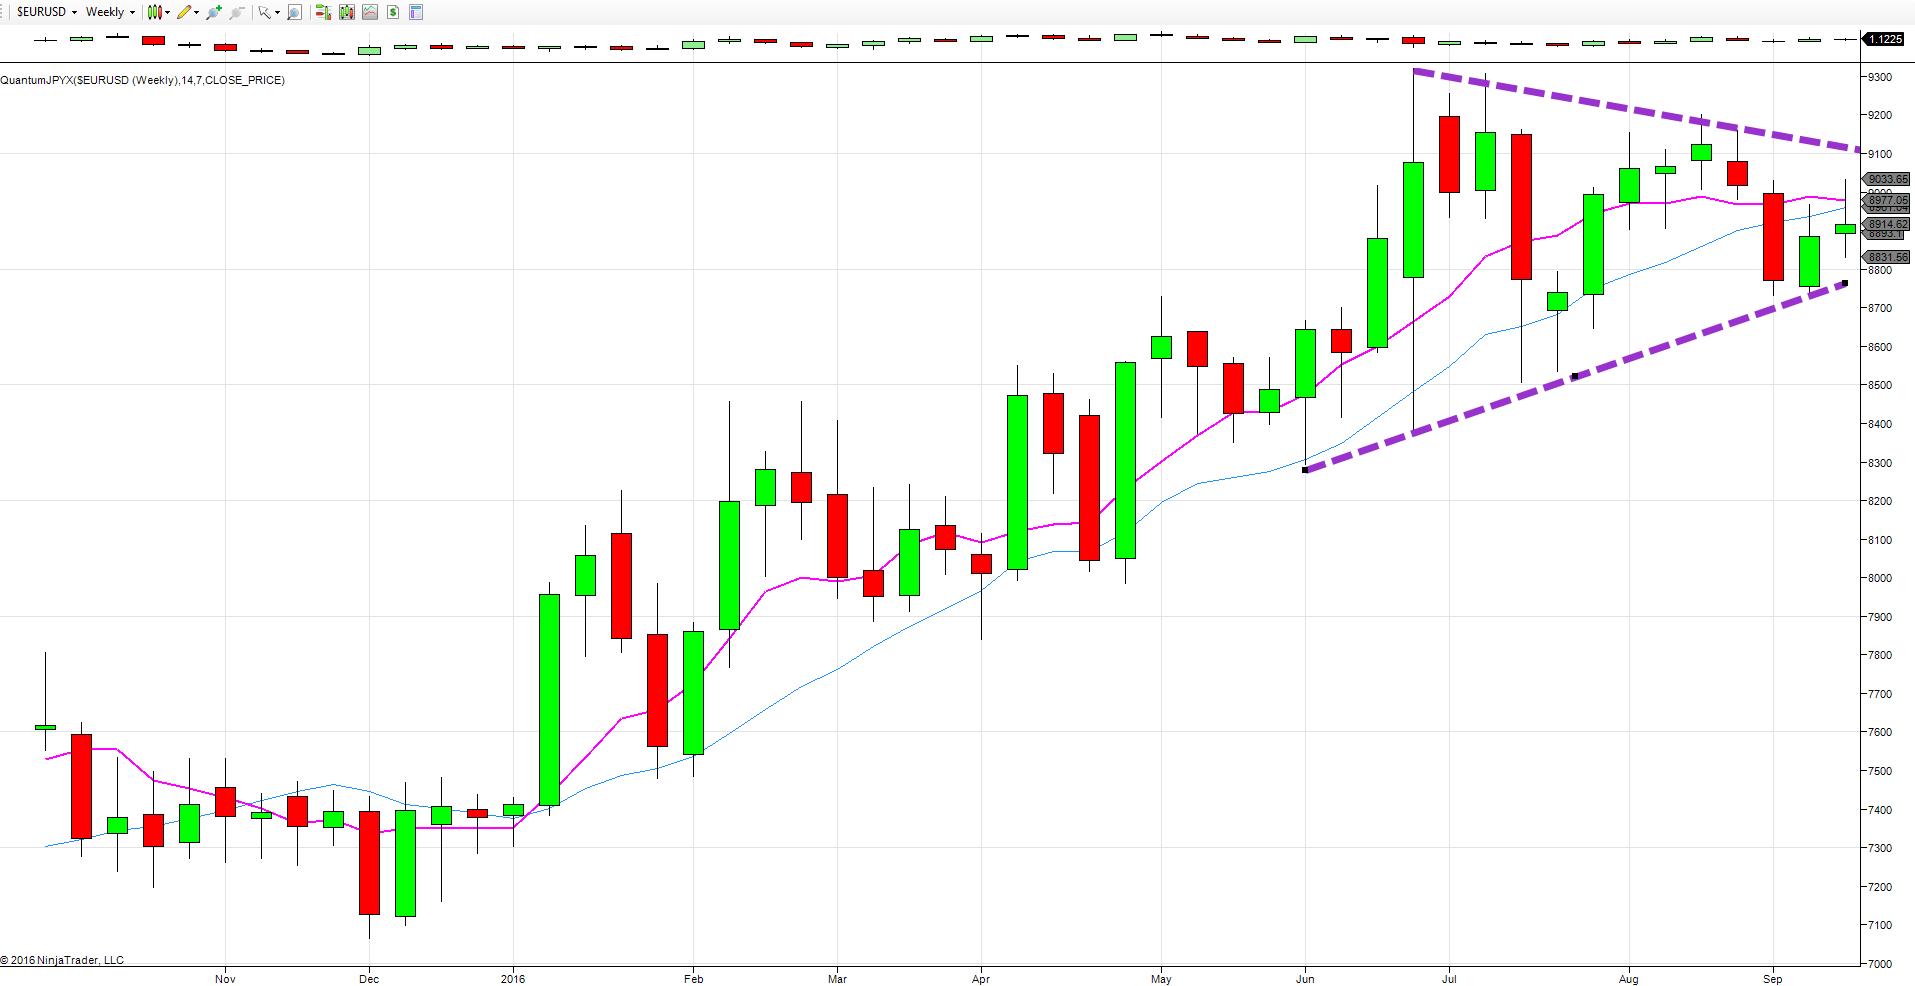 Yen index weekly chart